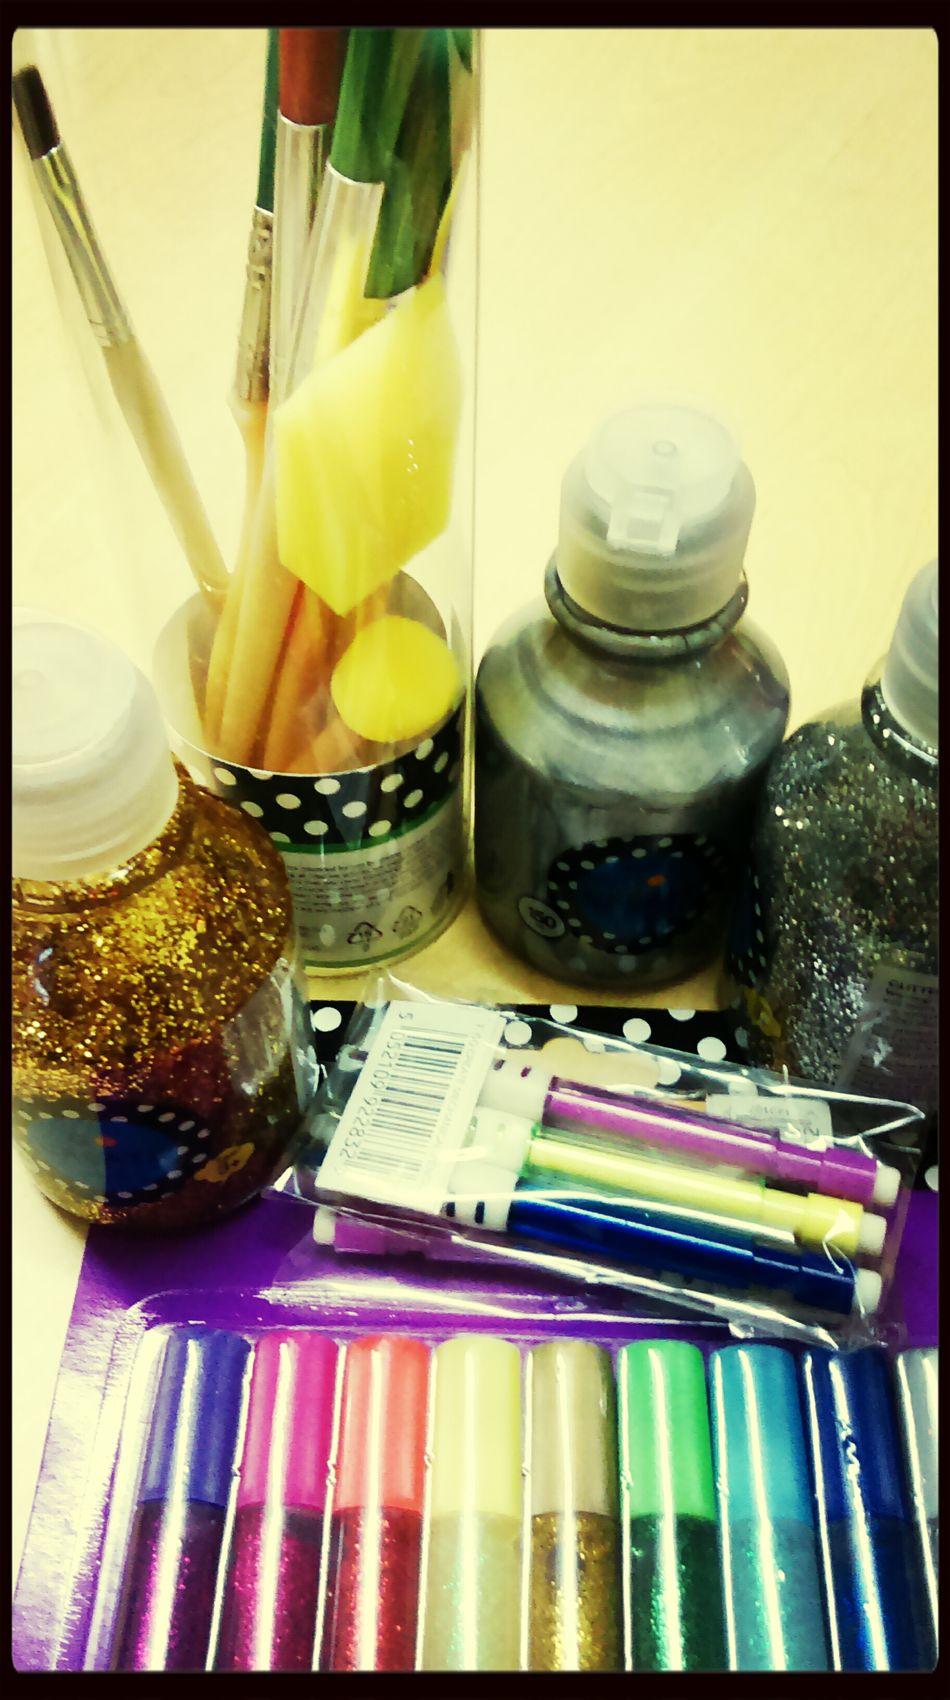 Rox's Creations @ staff accomodation Arts And Crafts Craft Work Materials Glitter